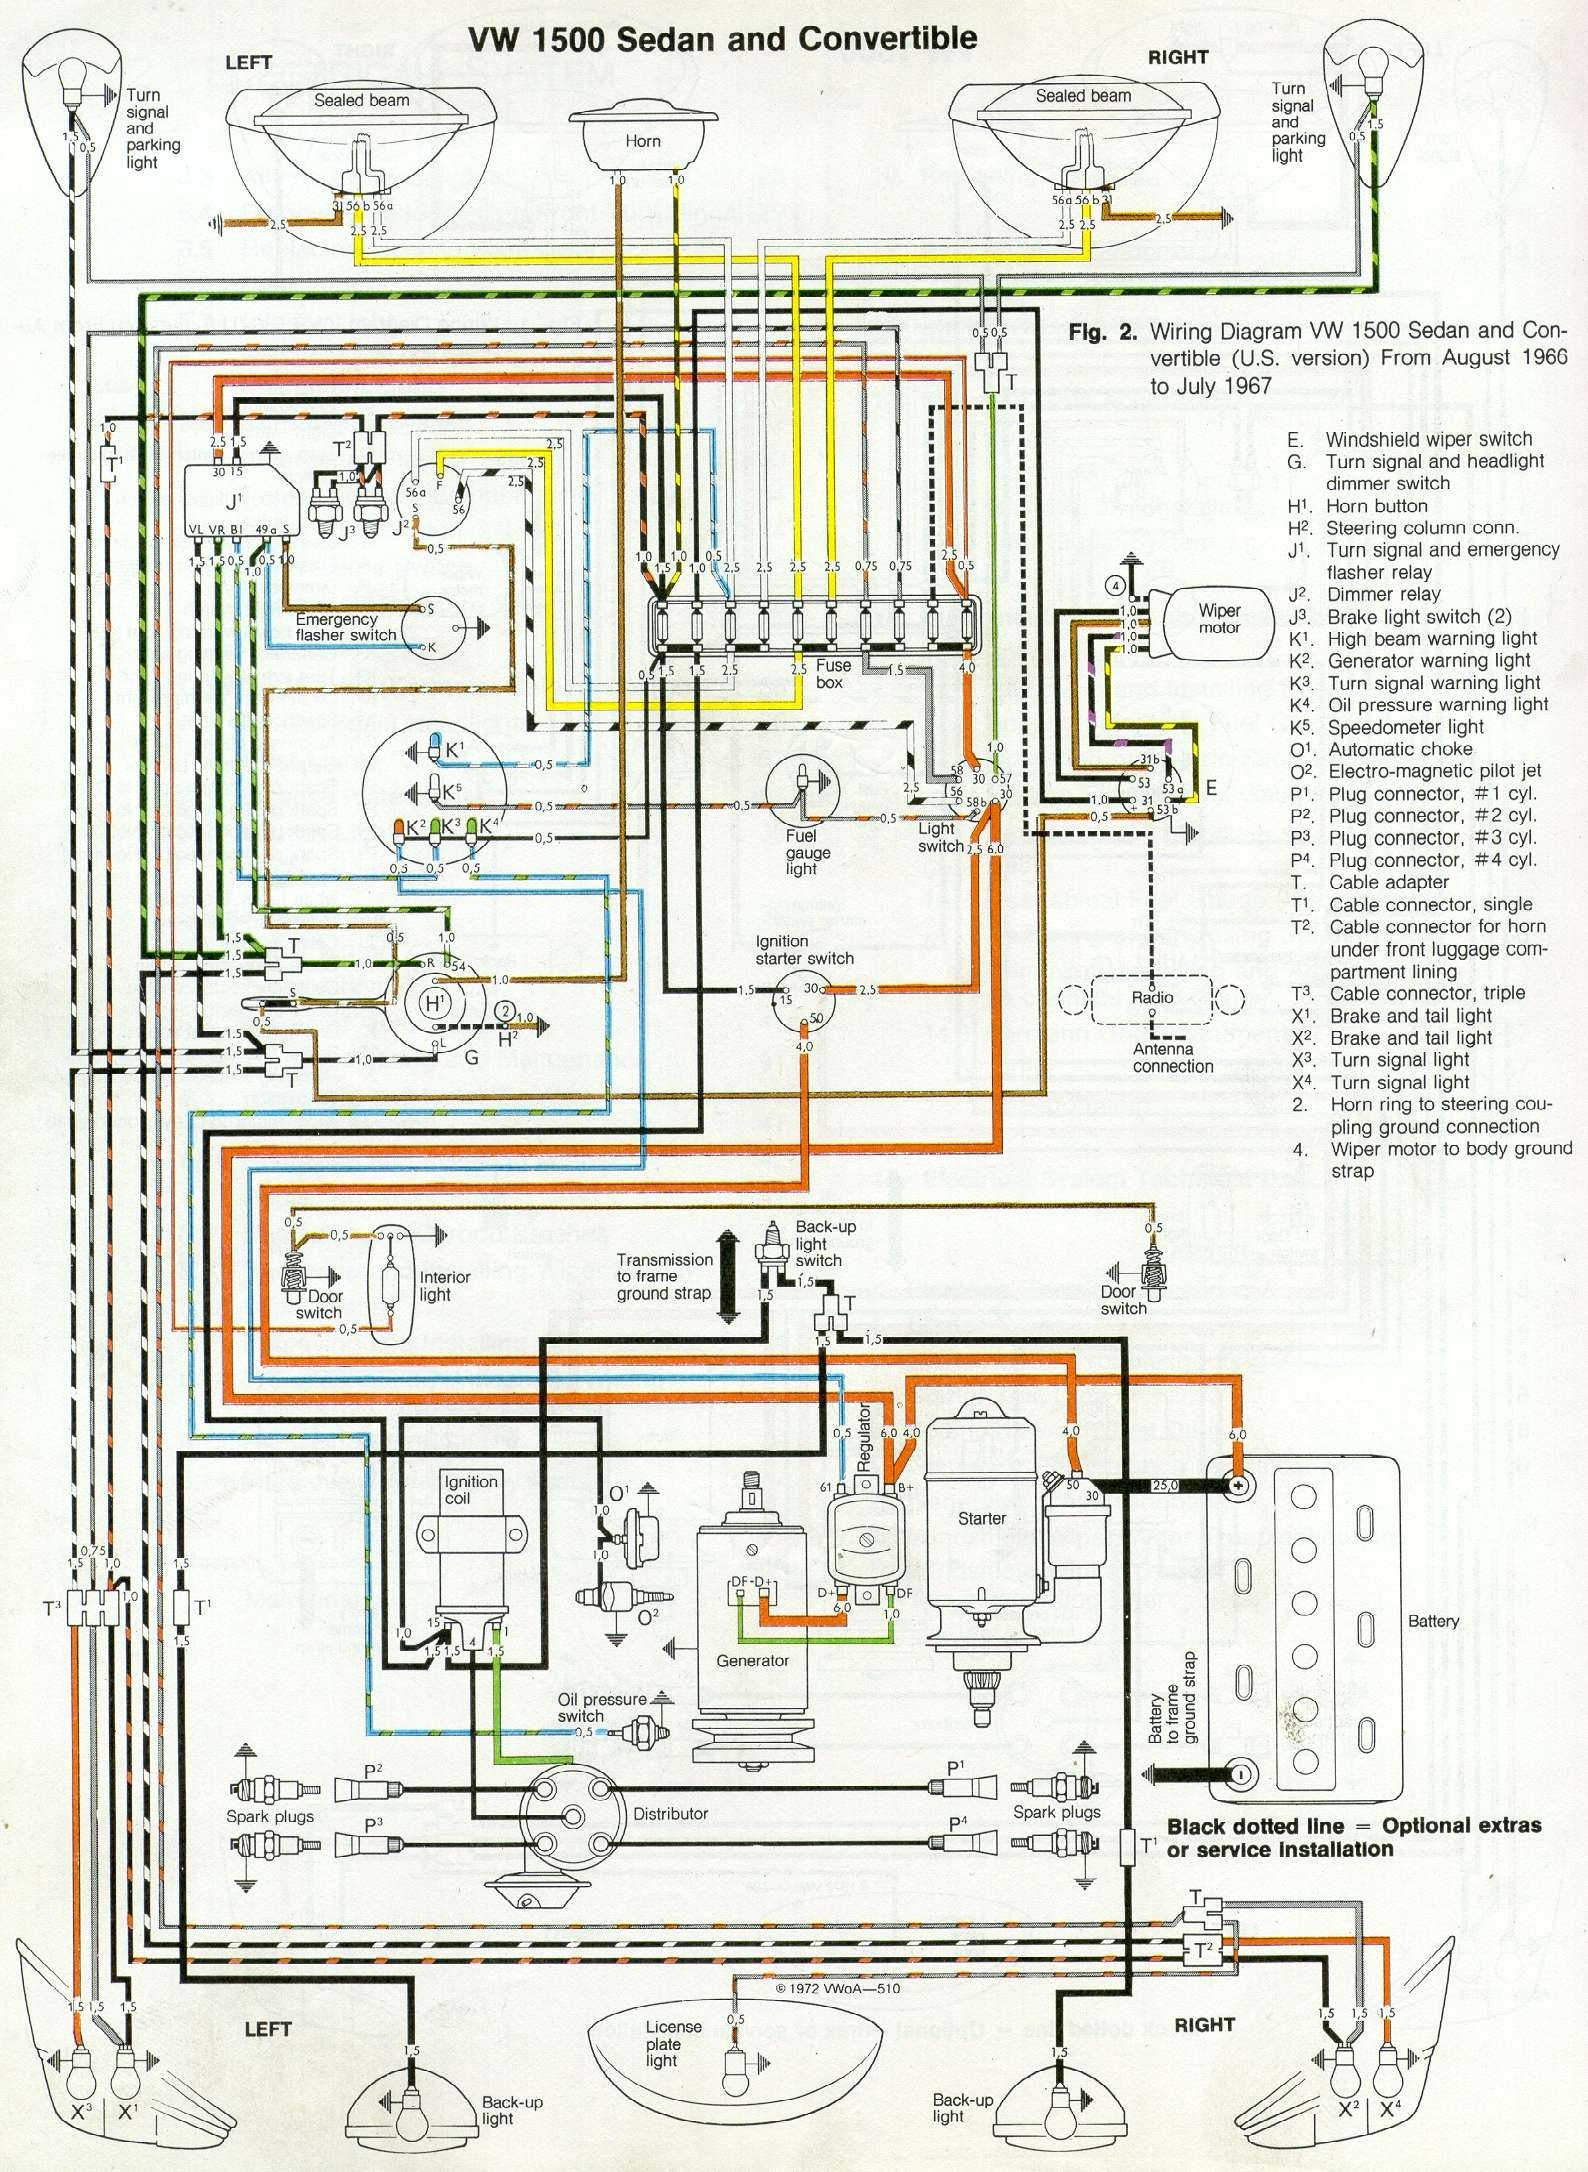 wiring diagram for 1967 vw beetle wiring diagram rh blaknwyt co VW Type 3 Wiring Diagram 1967 vw bus wiring diagram